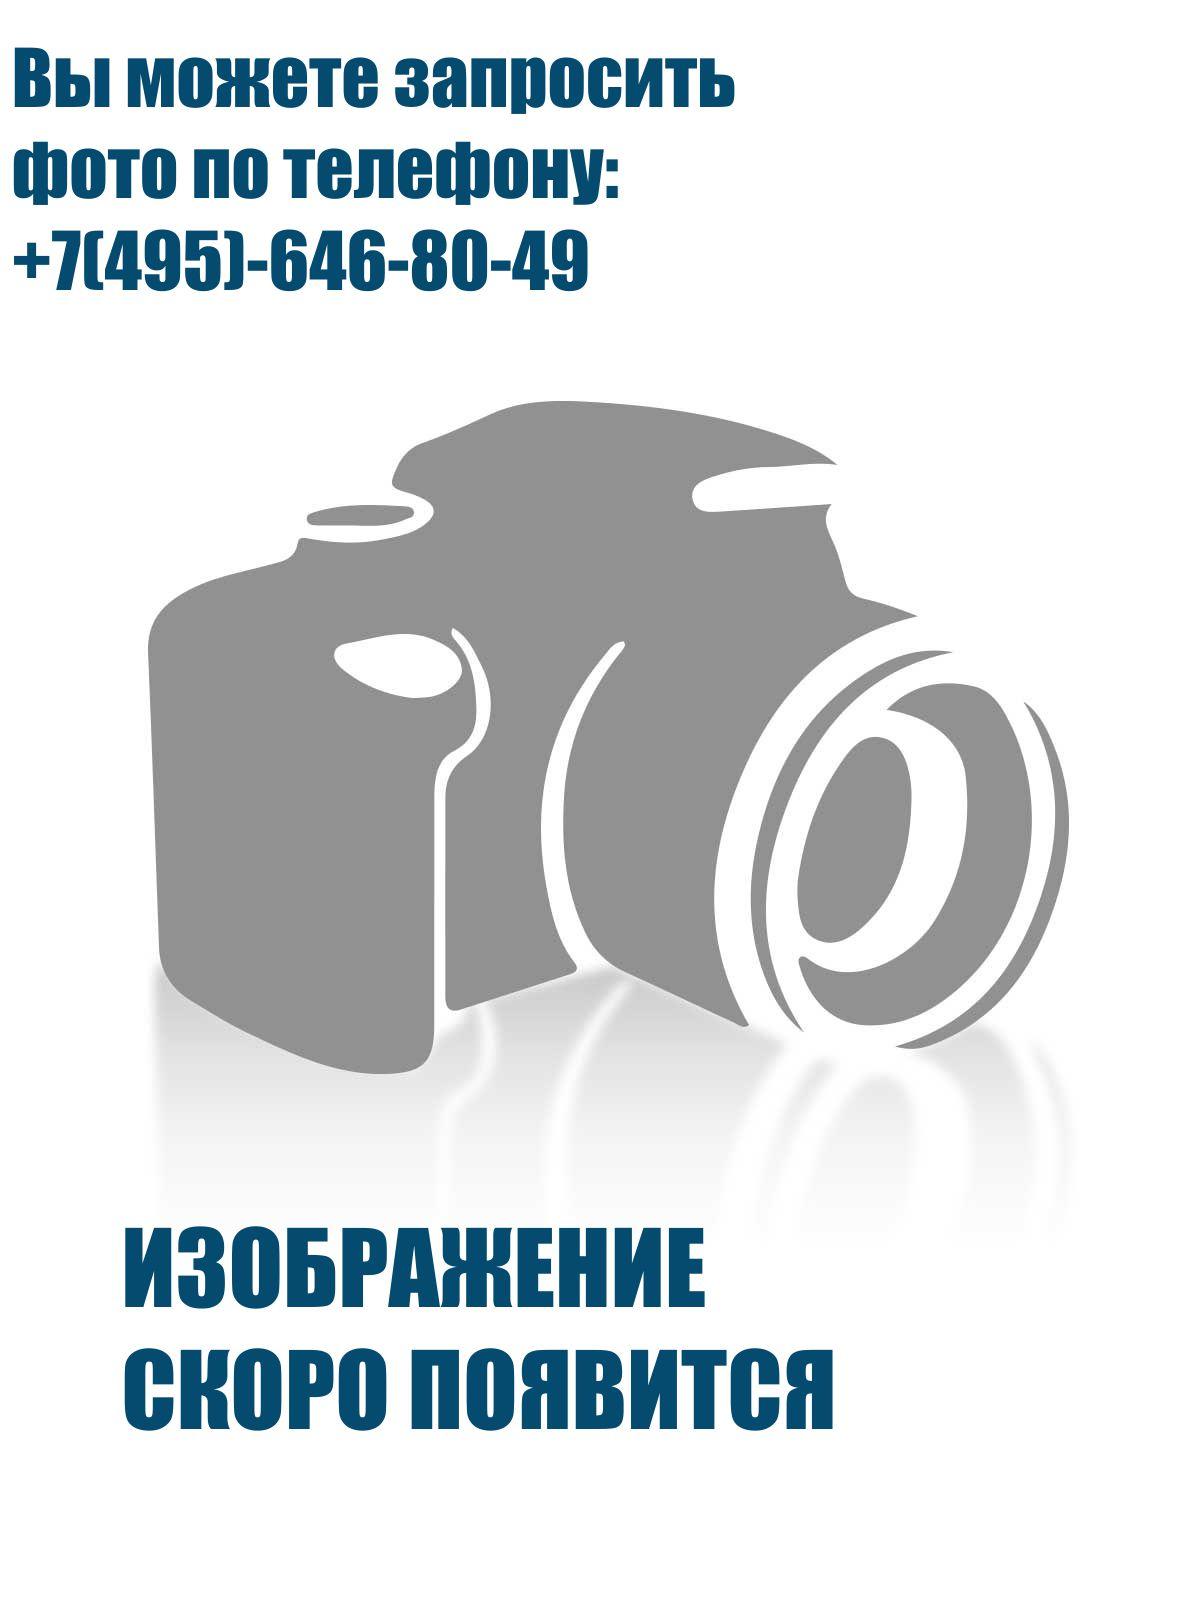 Самокат TT 180 Concept (2017) turquoiseДетские<br>Самокат TT 180 Concept (2017) turquoise<br><br>Бренд: None